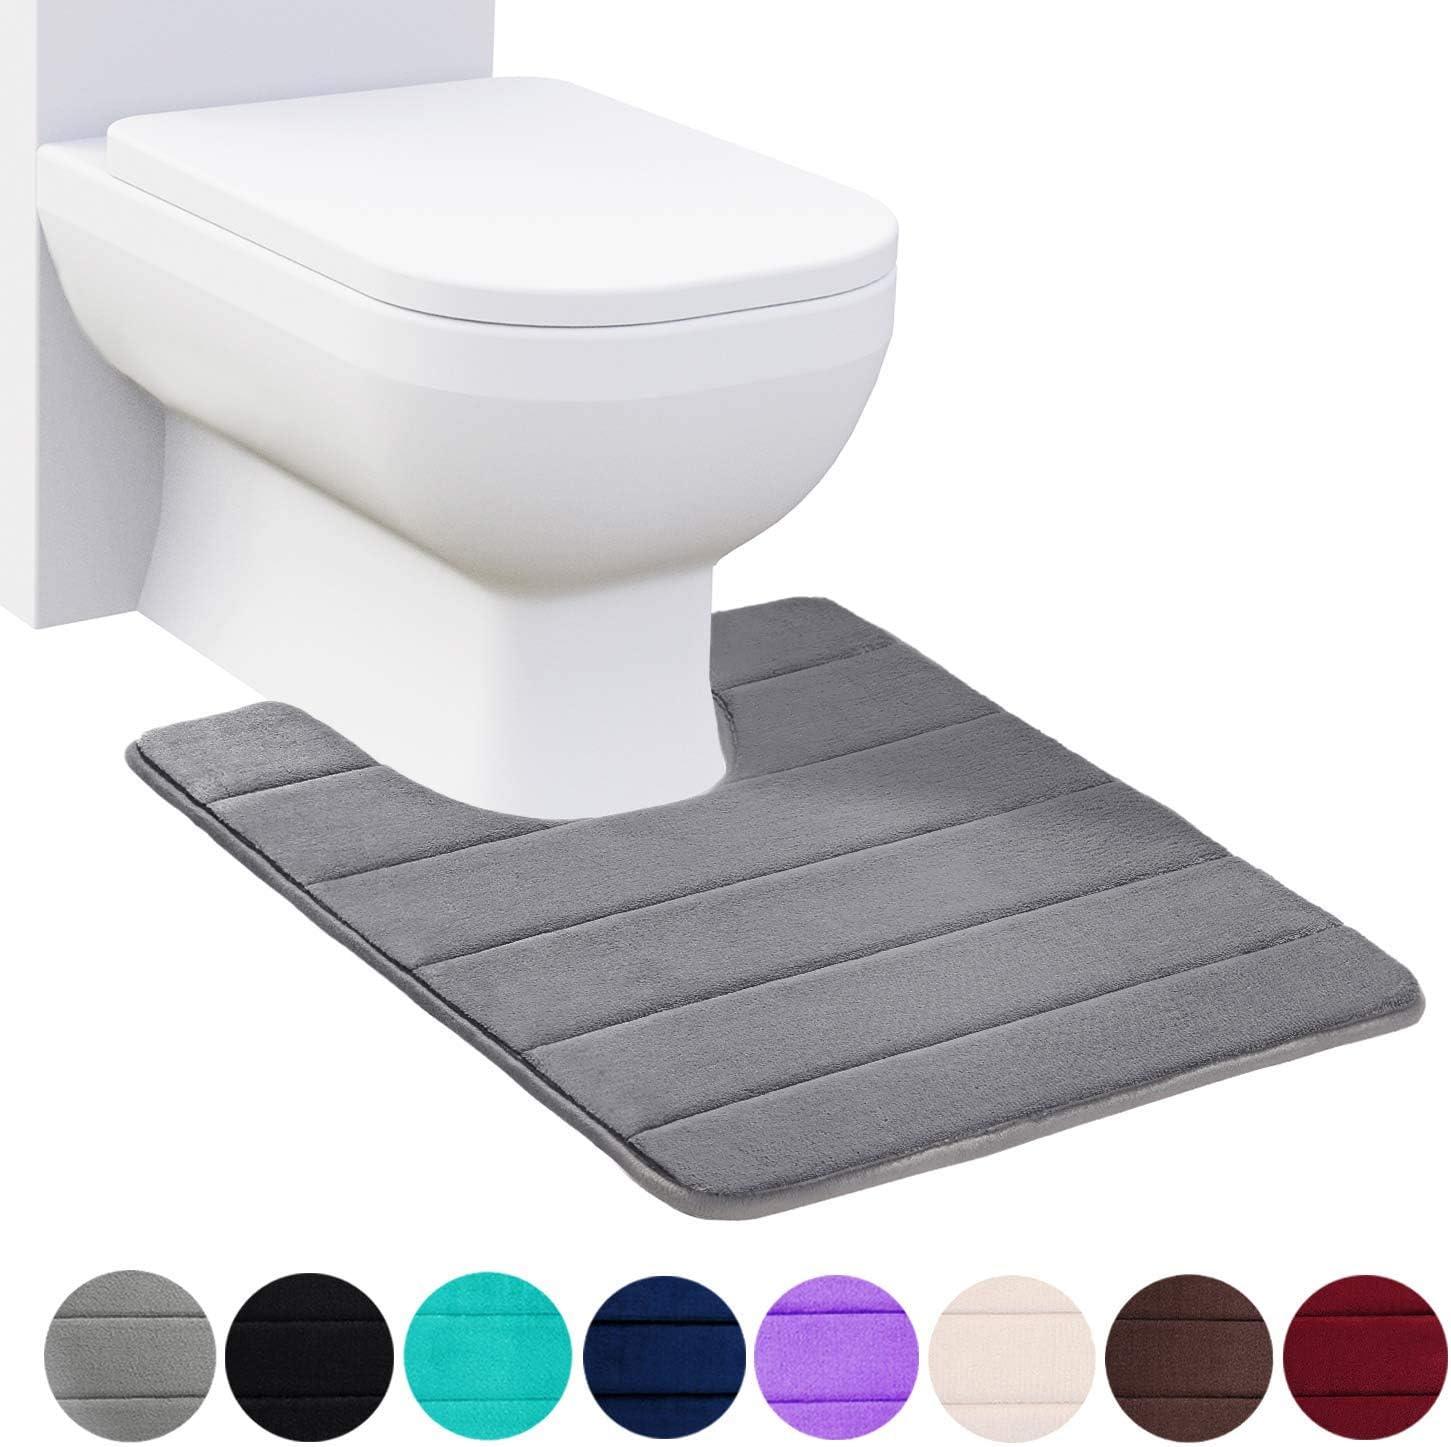 Floor Carpet Bath Mat for Bathroom Sink Toilet U-Shaped Non Slip Absorbent Thick Soft Washable Bathroom Rugs 20 x 24, Black Buganda Memory Foam Contour Toilet Bath Rug